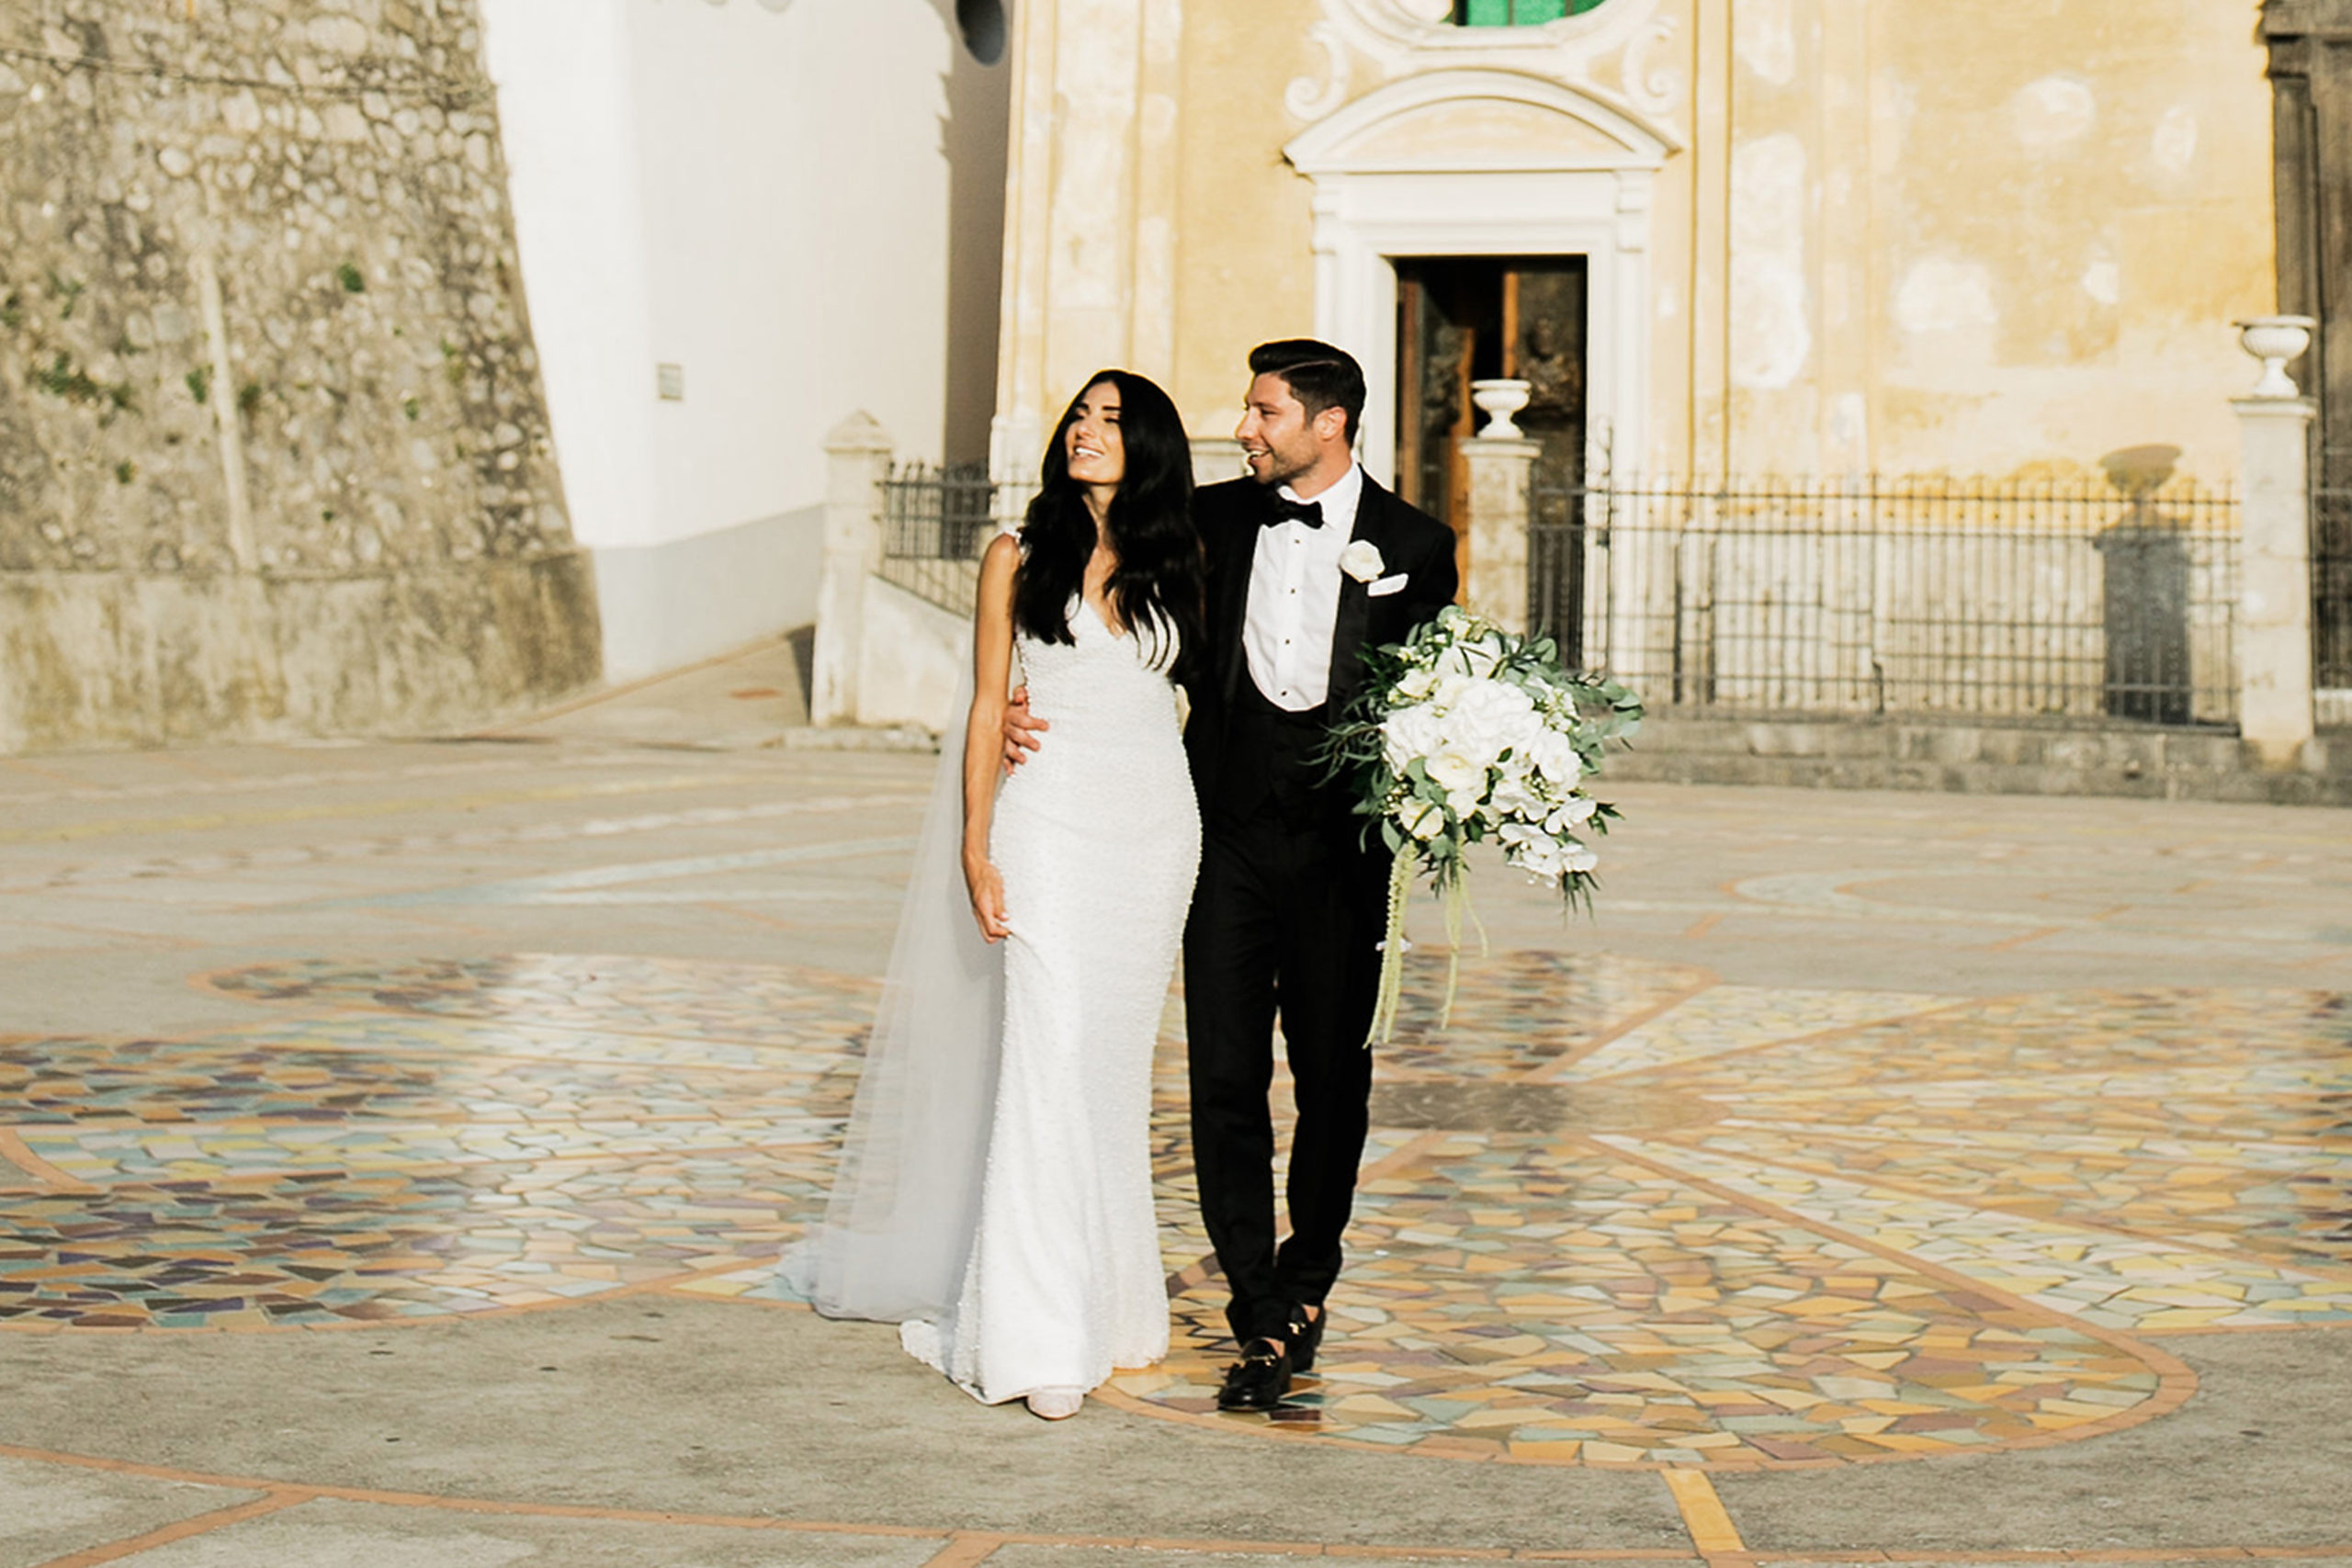 Tailor-Melbourne-Bespoke-Wedding-Menswear-Suit